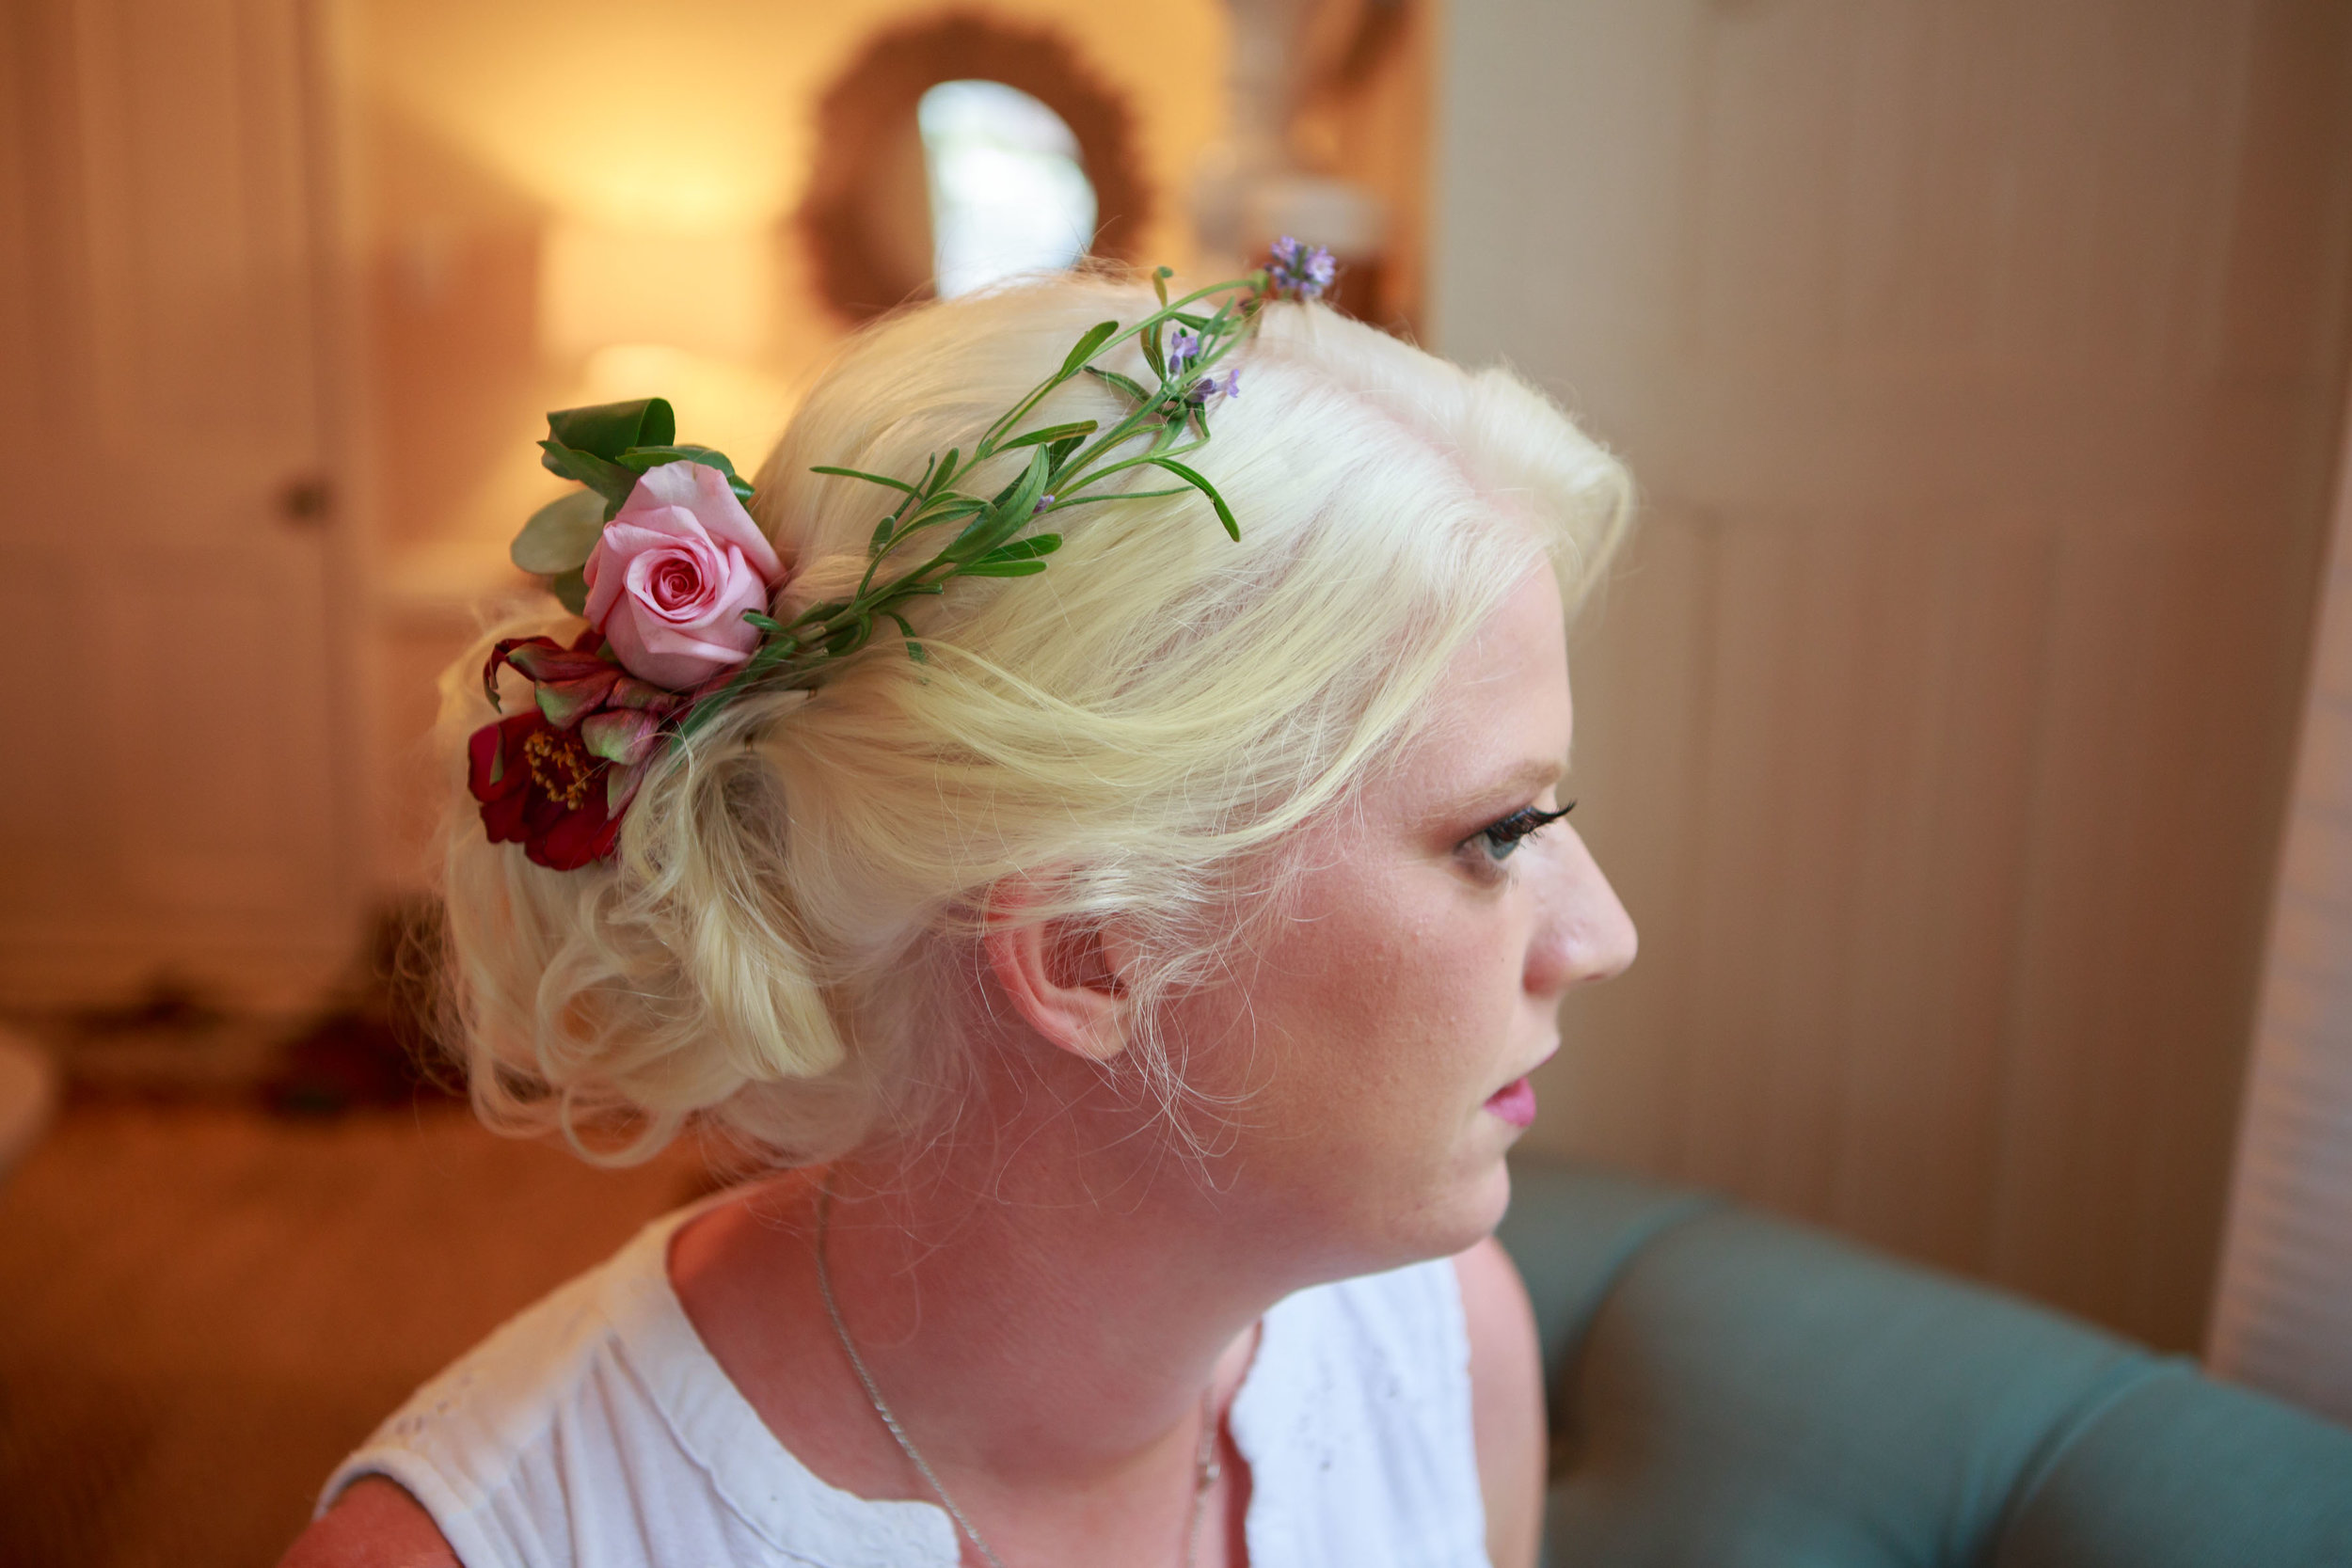 128-South-Wedding-Tiffany-Abruzzo-Photography-Girls-Prep-54.jpg